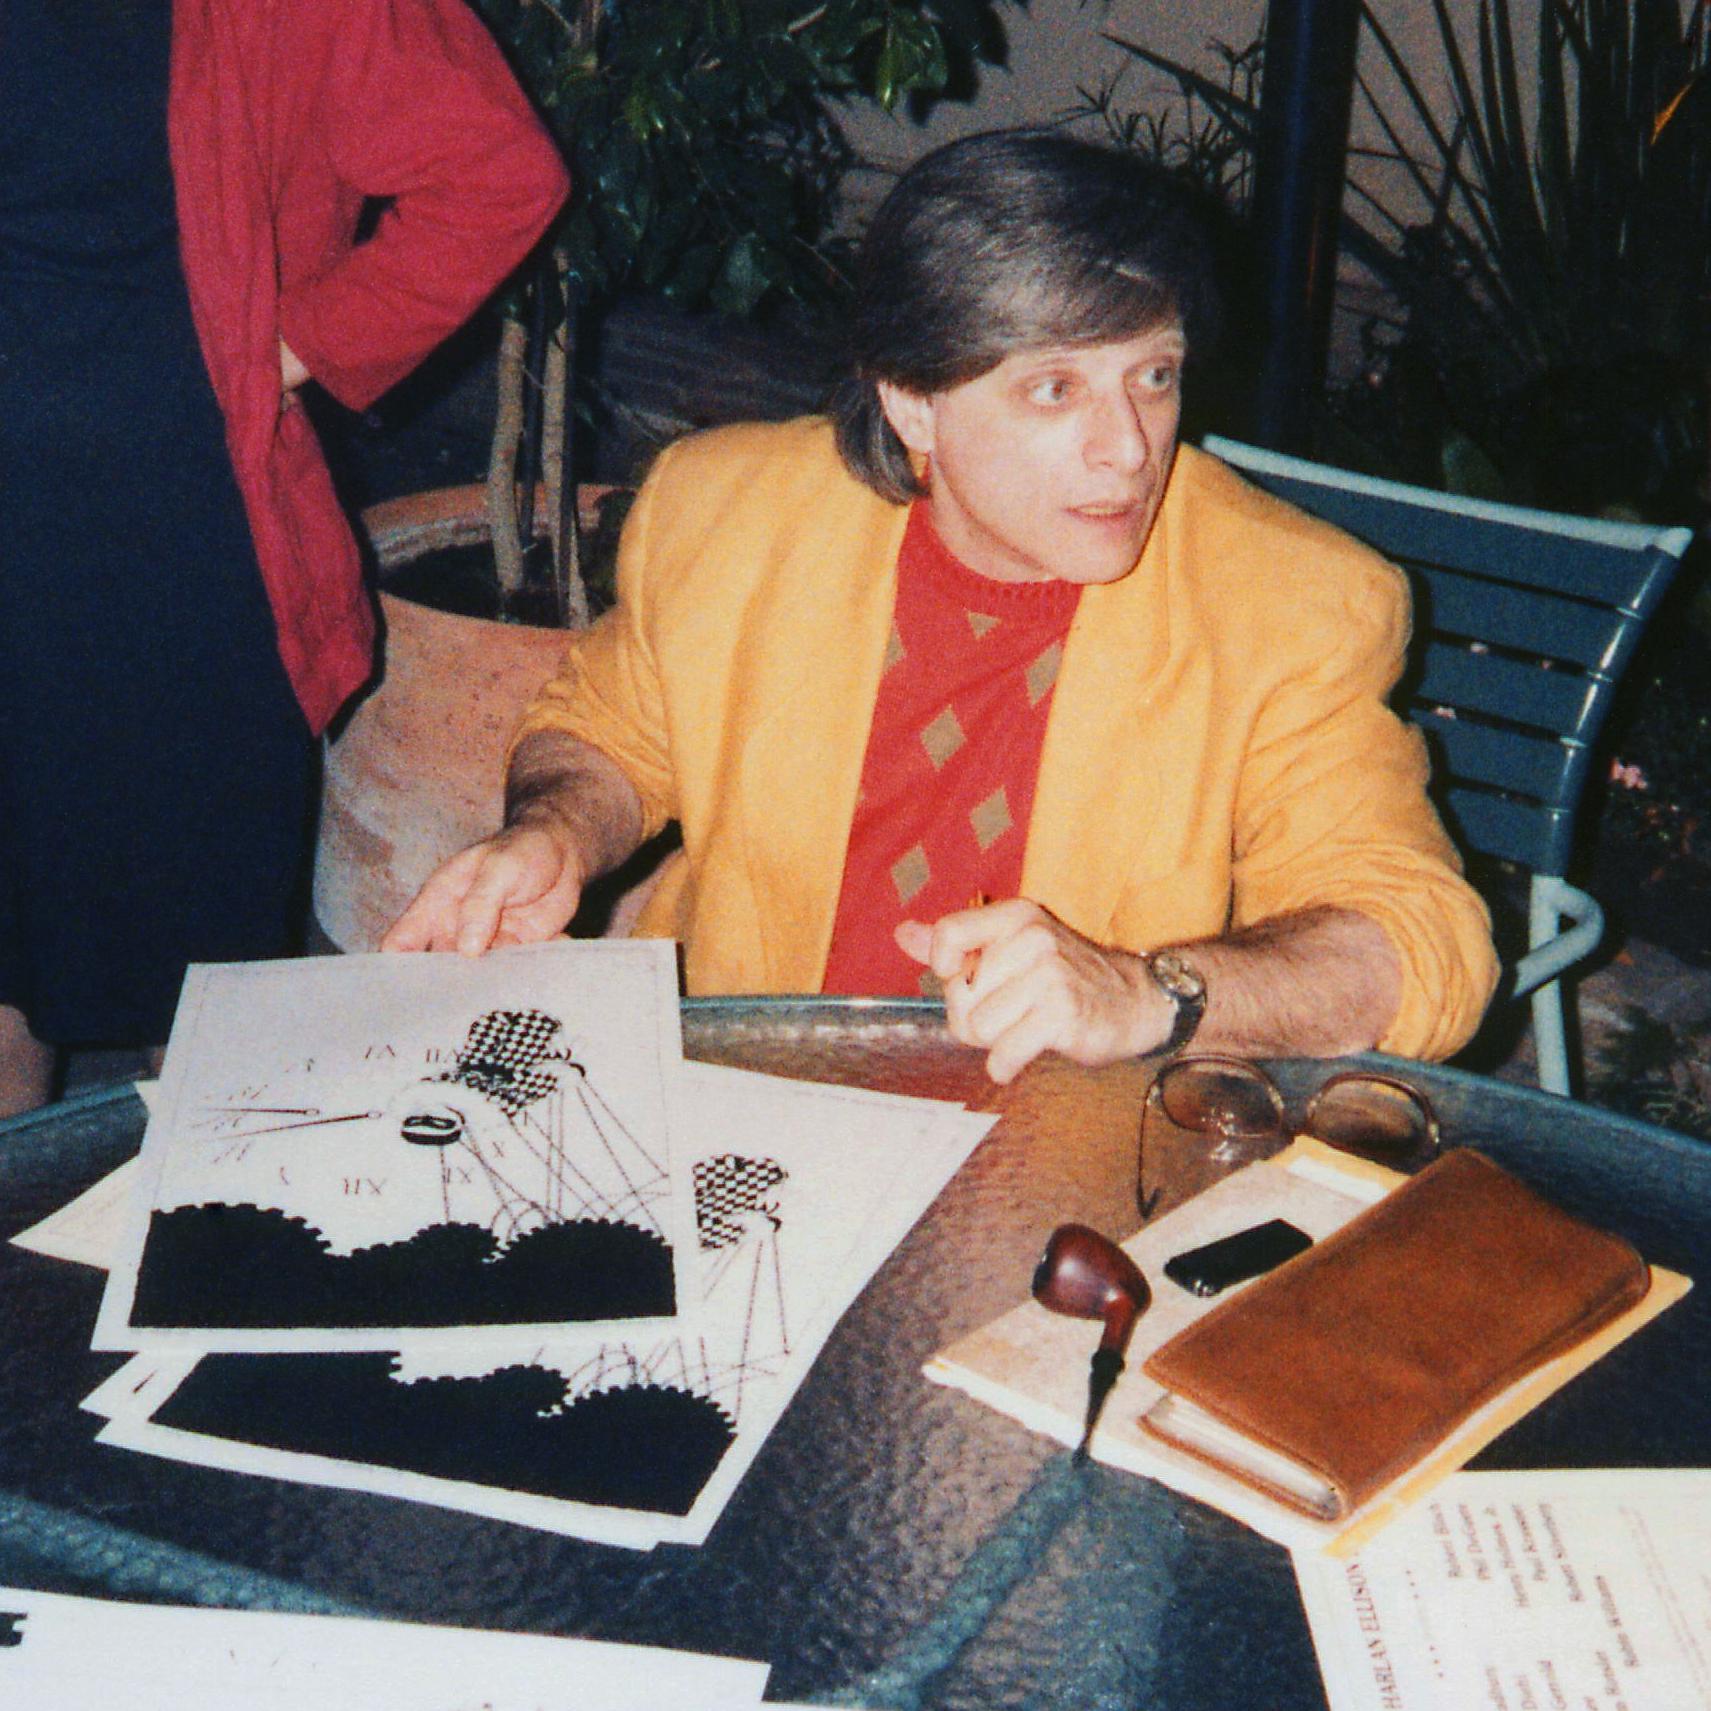 Harlan Ellison (1986)